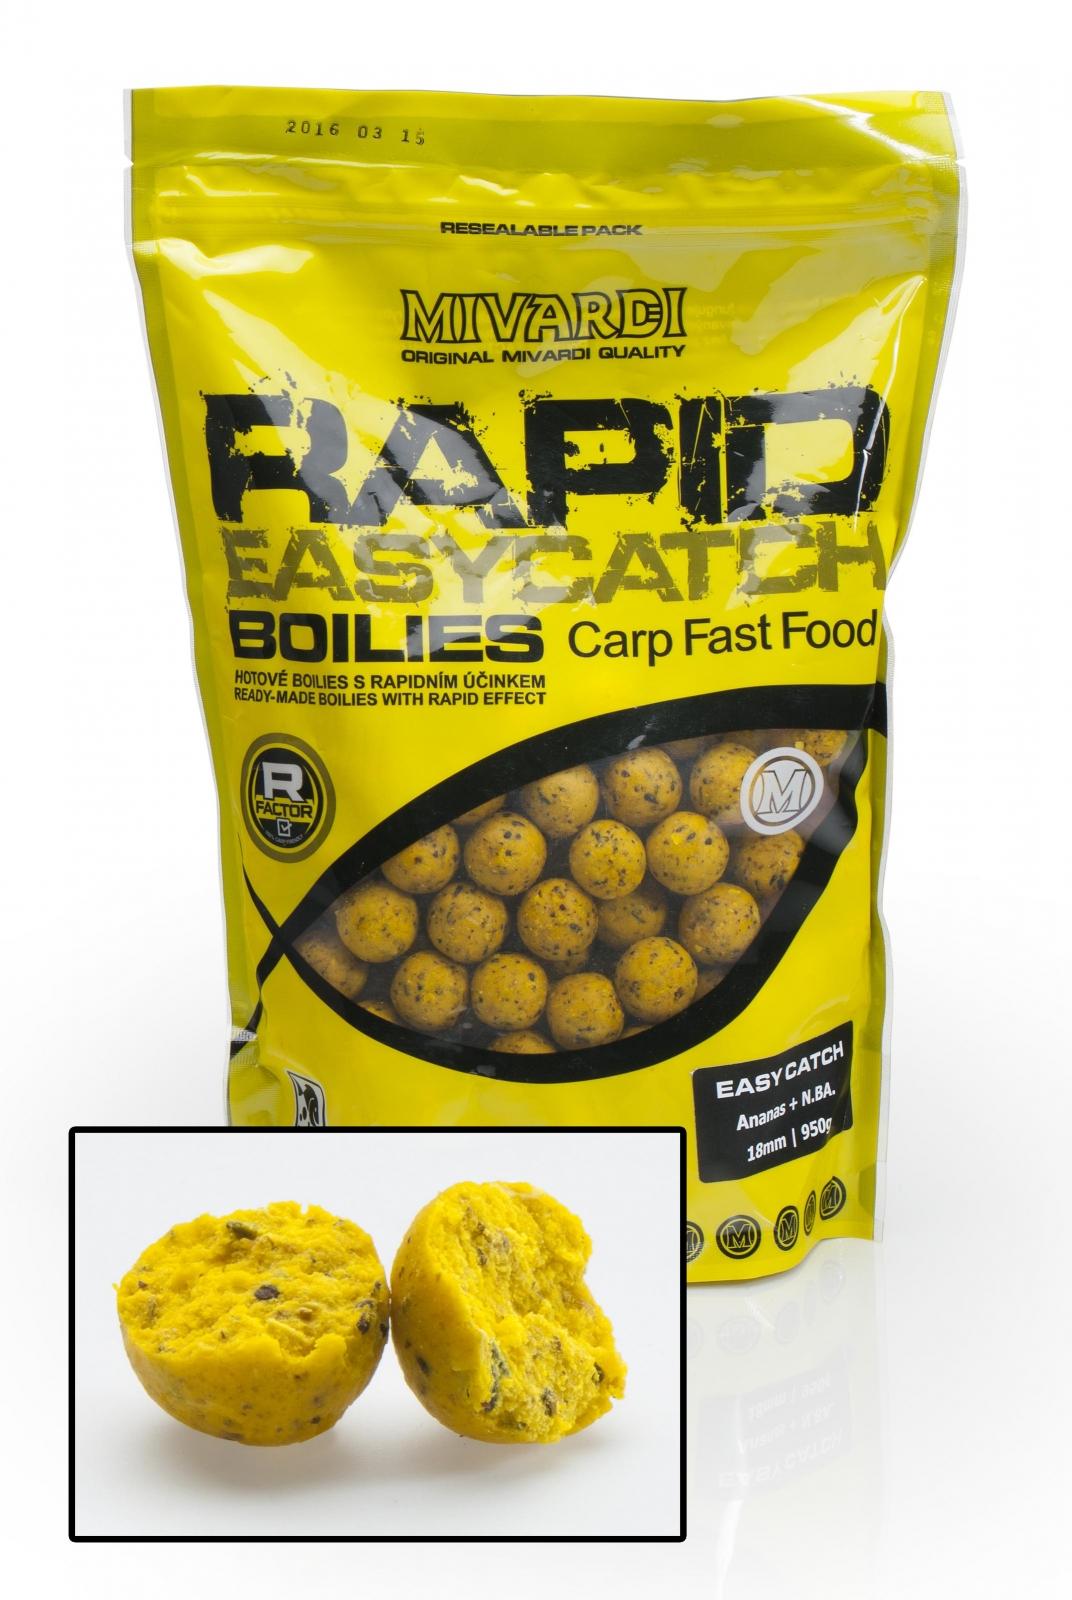 Mivardi boilies Rapid Easy Catch - Ananas +N.BA. 950g 24mm